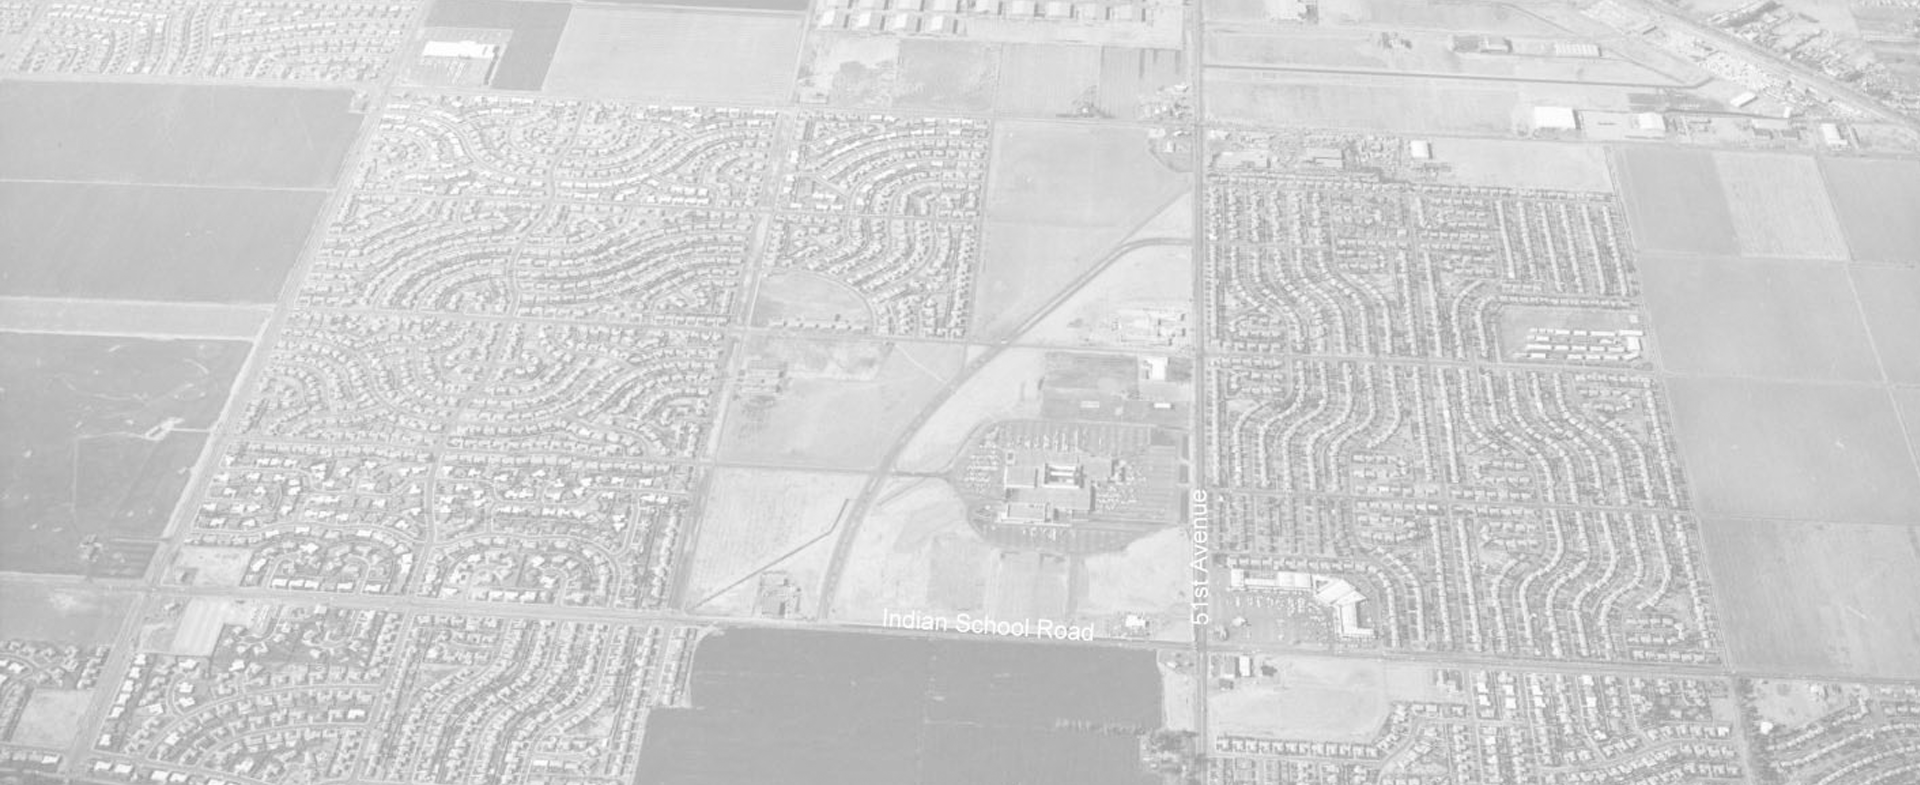 6-1959-Aerial_1920x785-50